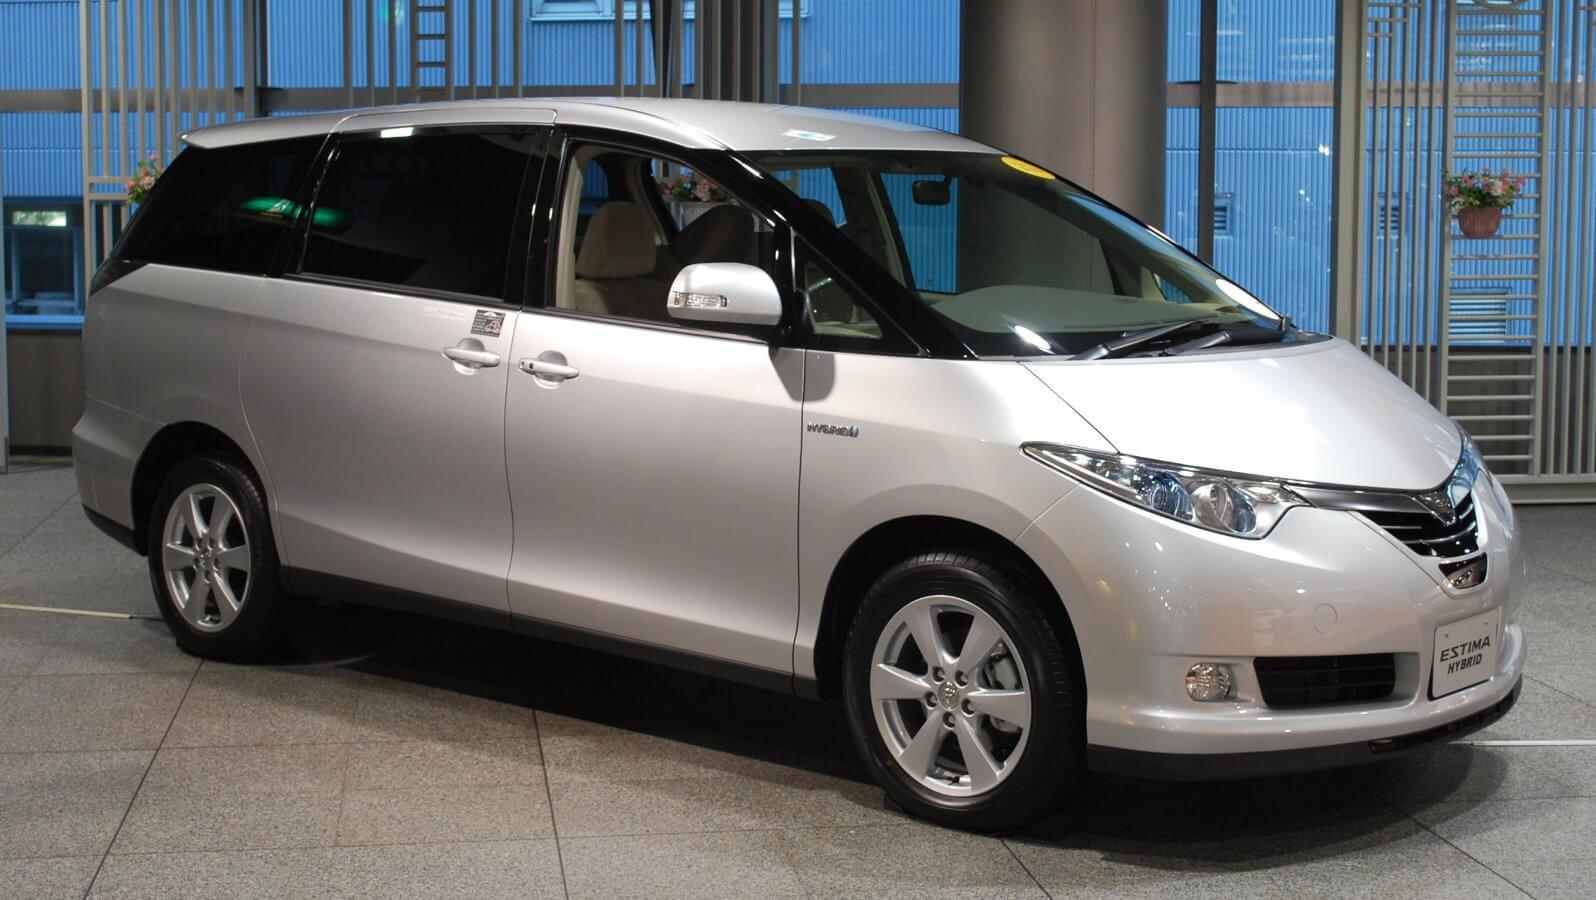 Toyota Estima I 1990 - 2000 Minivan #1